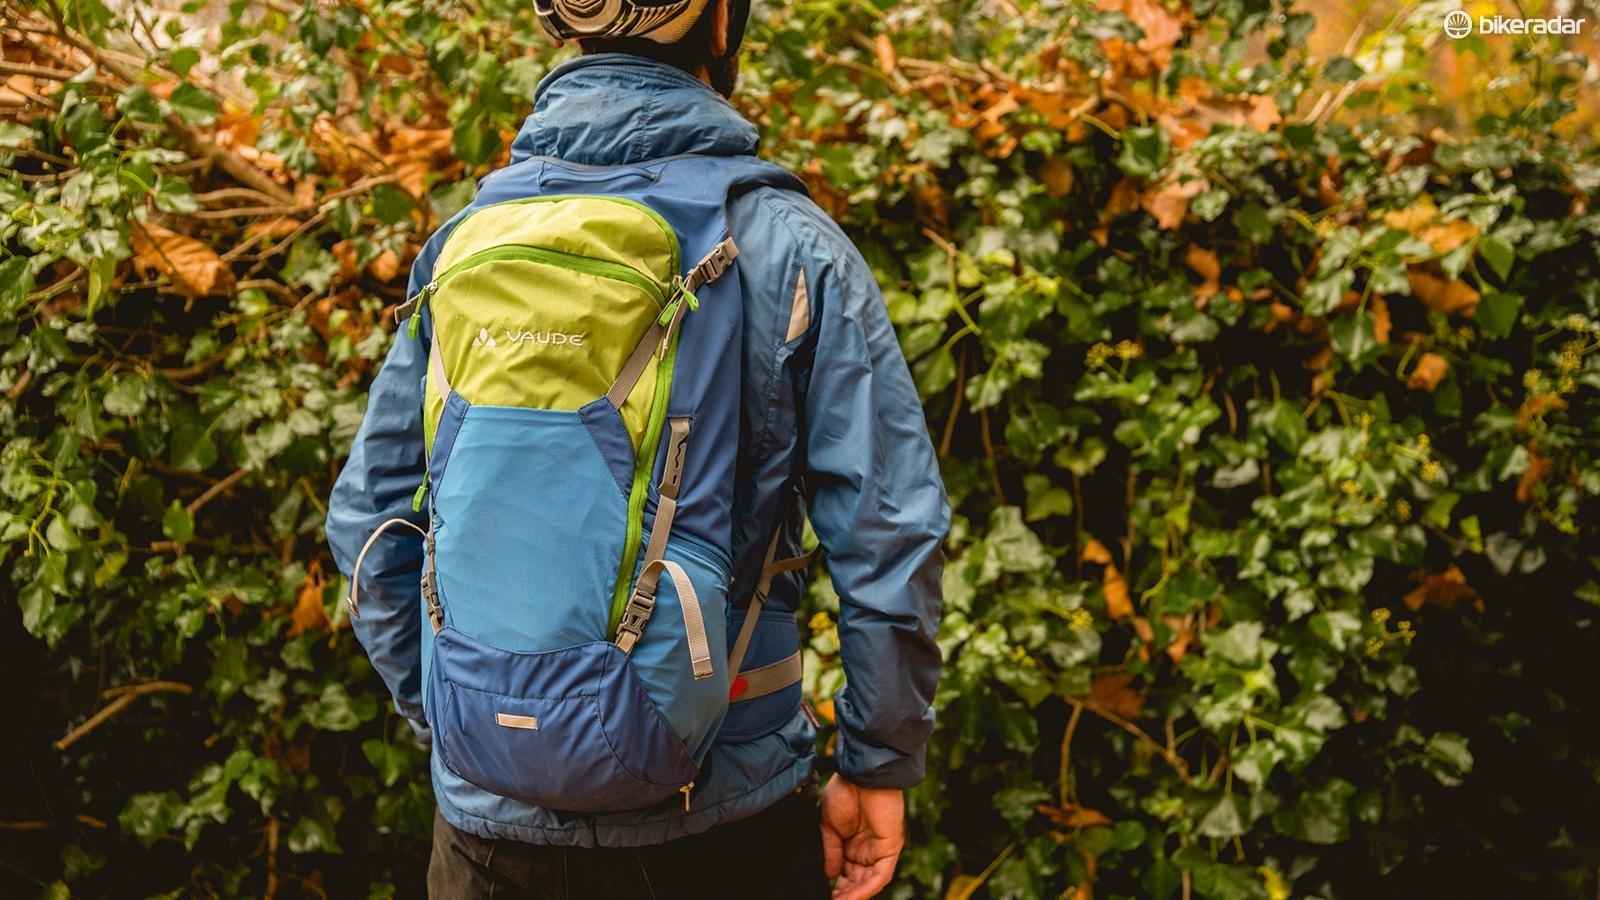 Vaude's Moab Pro 22 L backpack